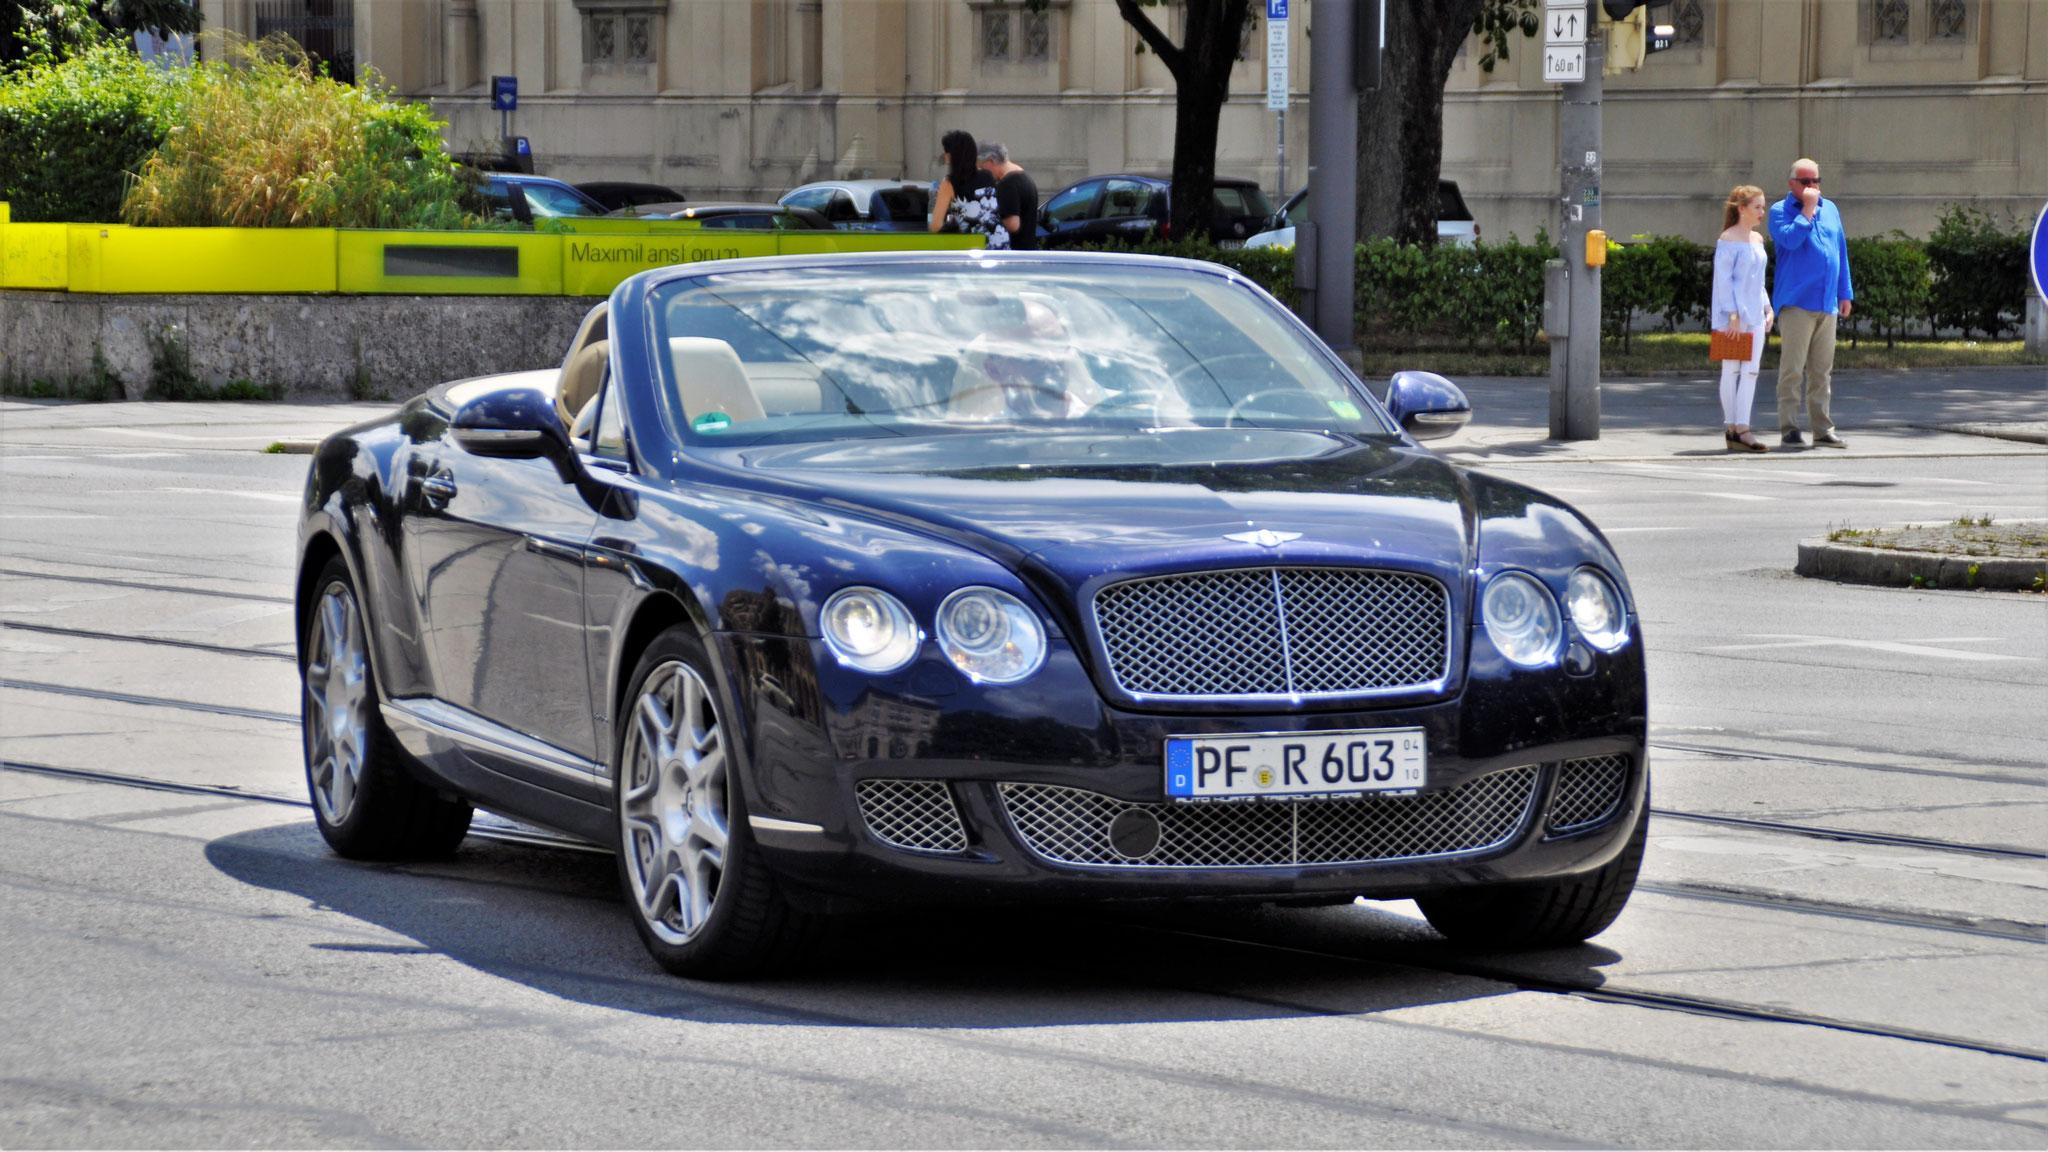 Bentley Continental GTC W12 - PF-R-603